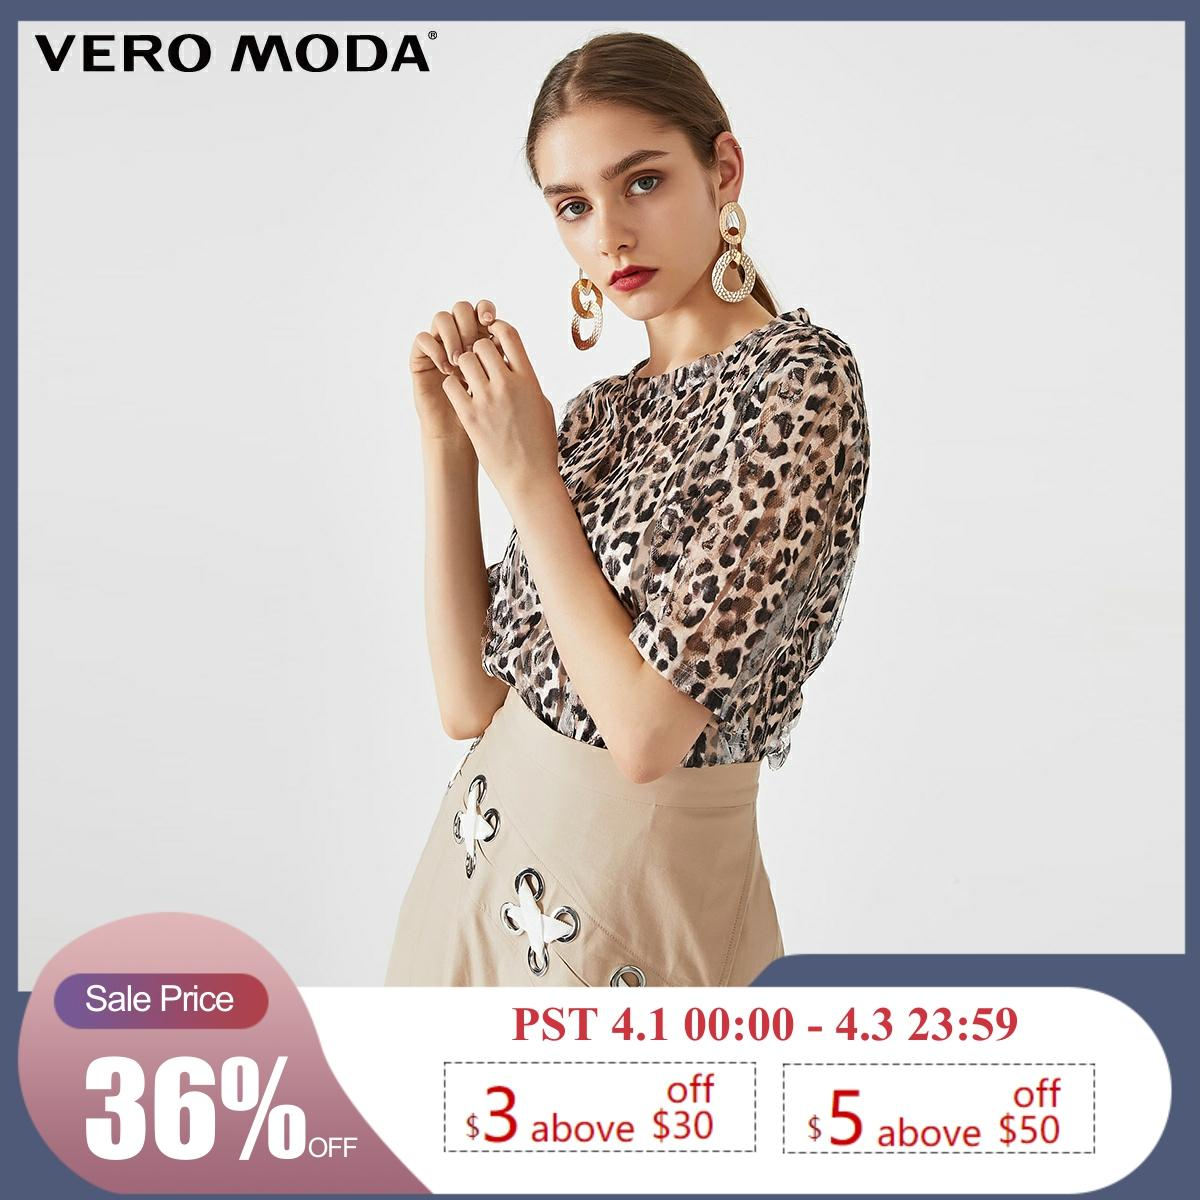 Vero Moda Women's Leopard Print Elbow Sleeves Two-piece Tops Blouse   3192T1549